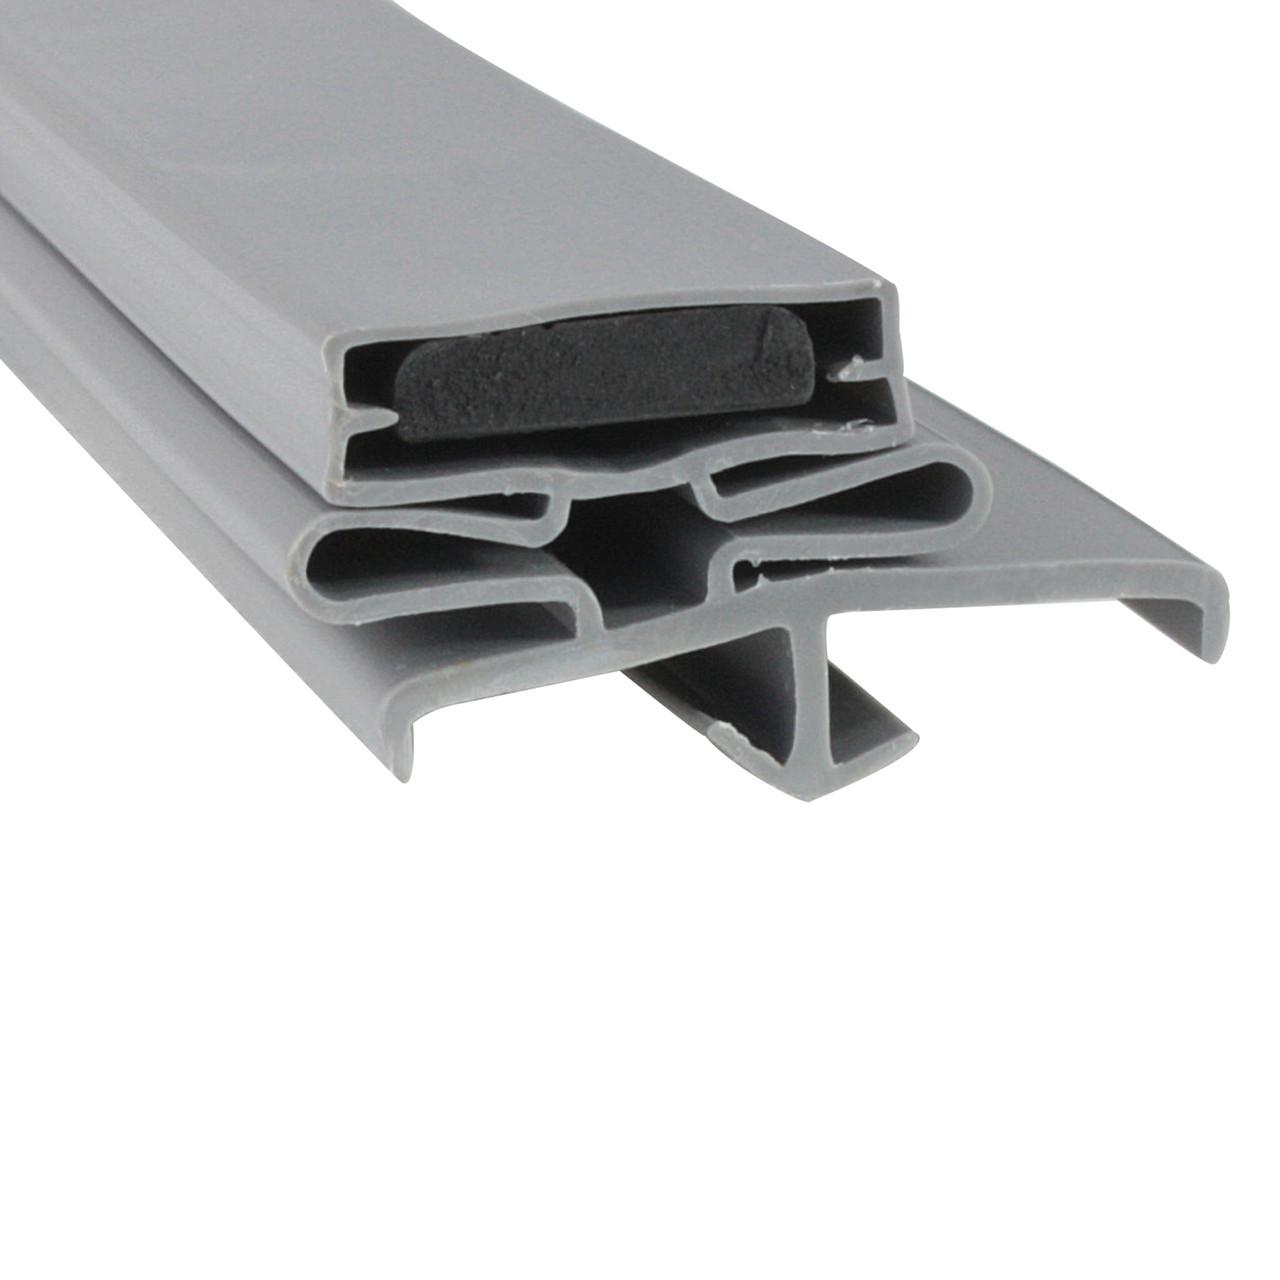 Kolpak Door Gasket Profile 168 22 1/4 x 38 1/4 -1